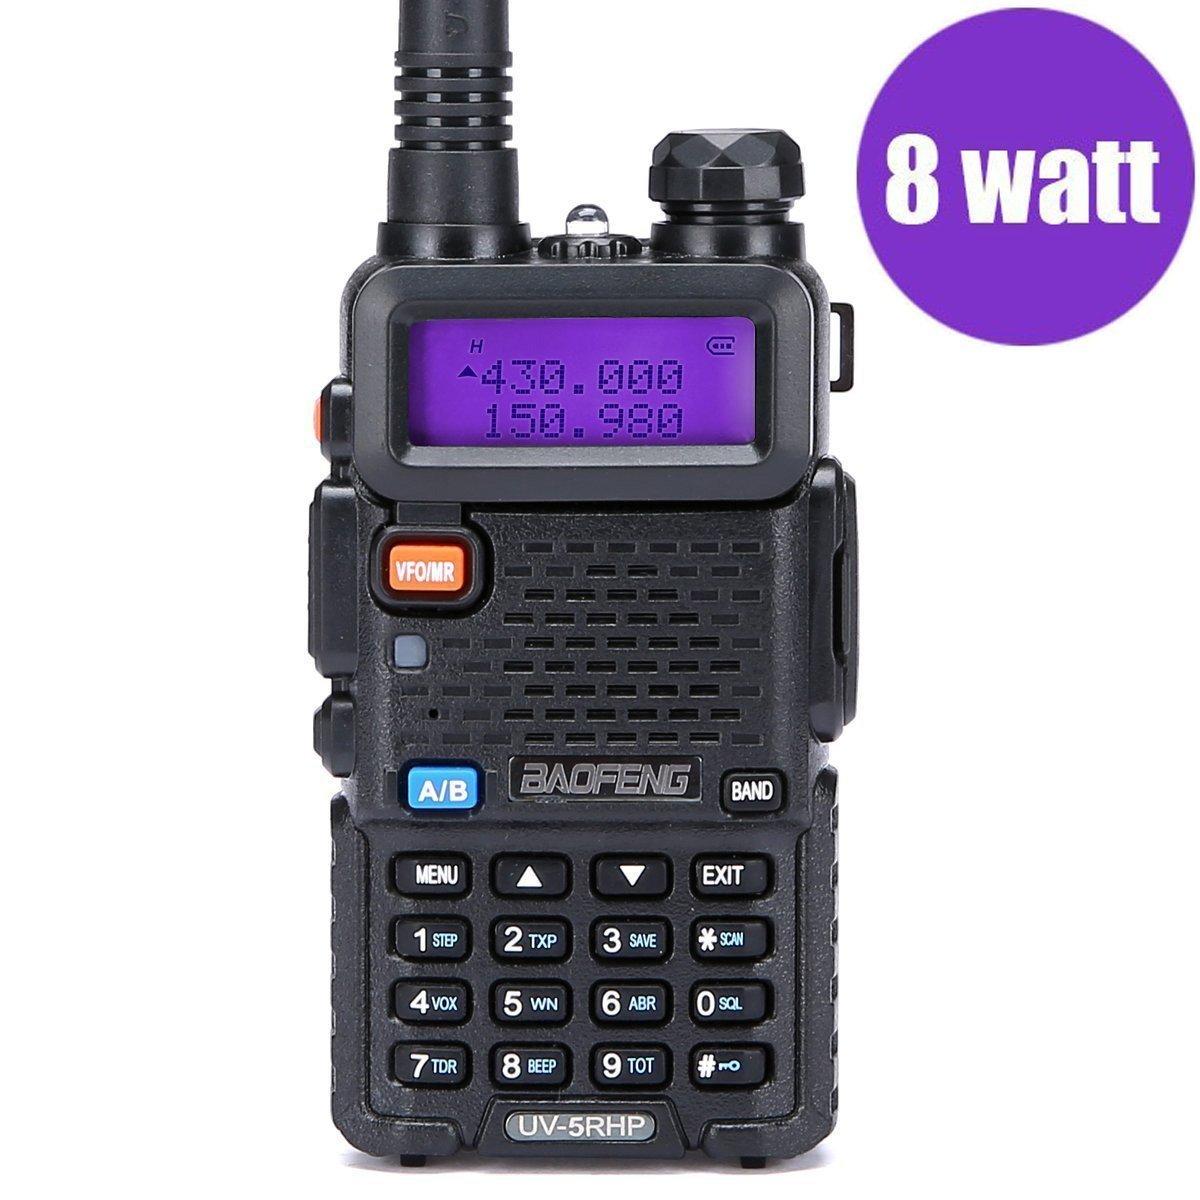 Walkie Talkies 2 Way Radio BaoFeng Radio Series UV-5RH High Power 8 Watt Dual Band Two Way Radio for Hiking Camping Trolling (Newer Version of Baofeng UV-5R) by LUITON by LUITON